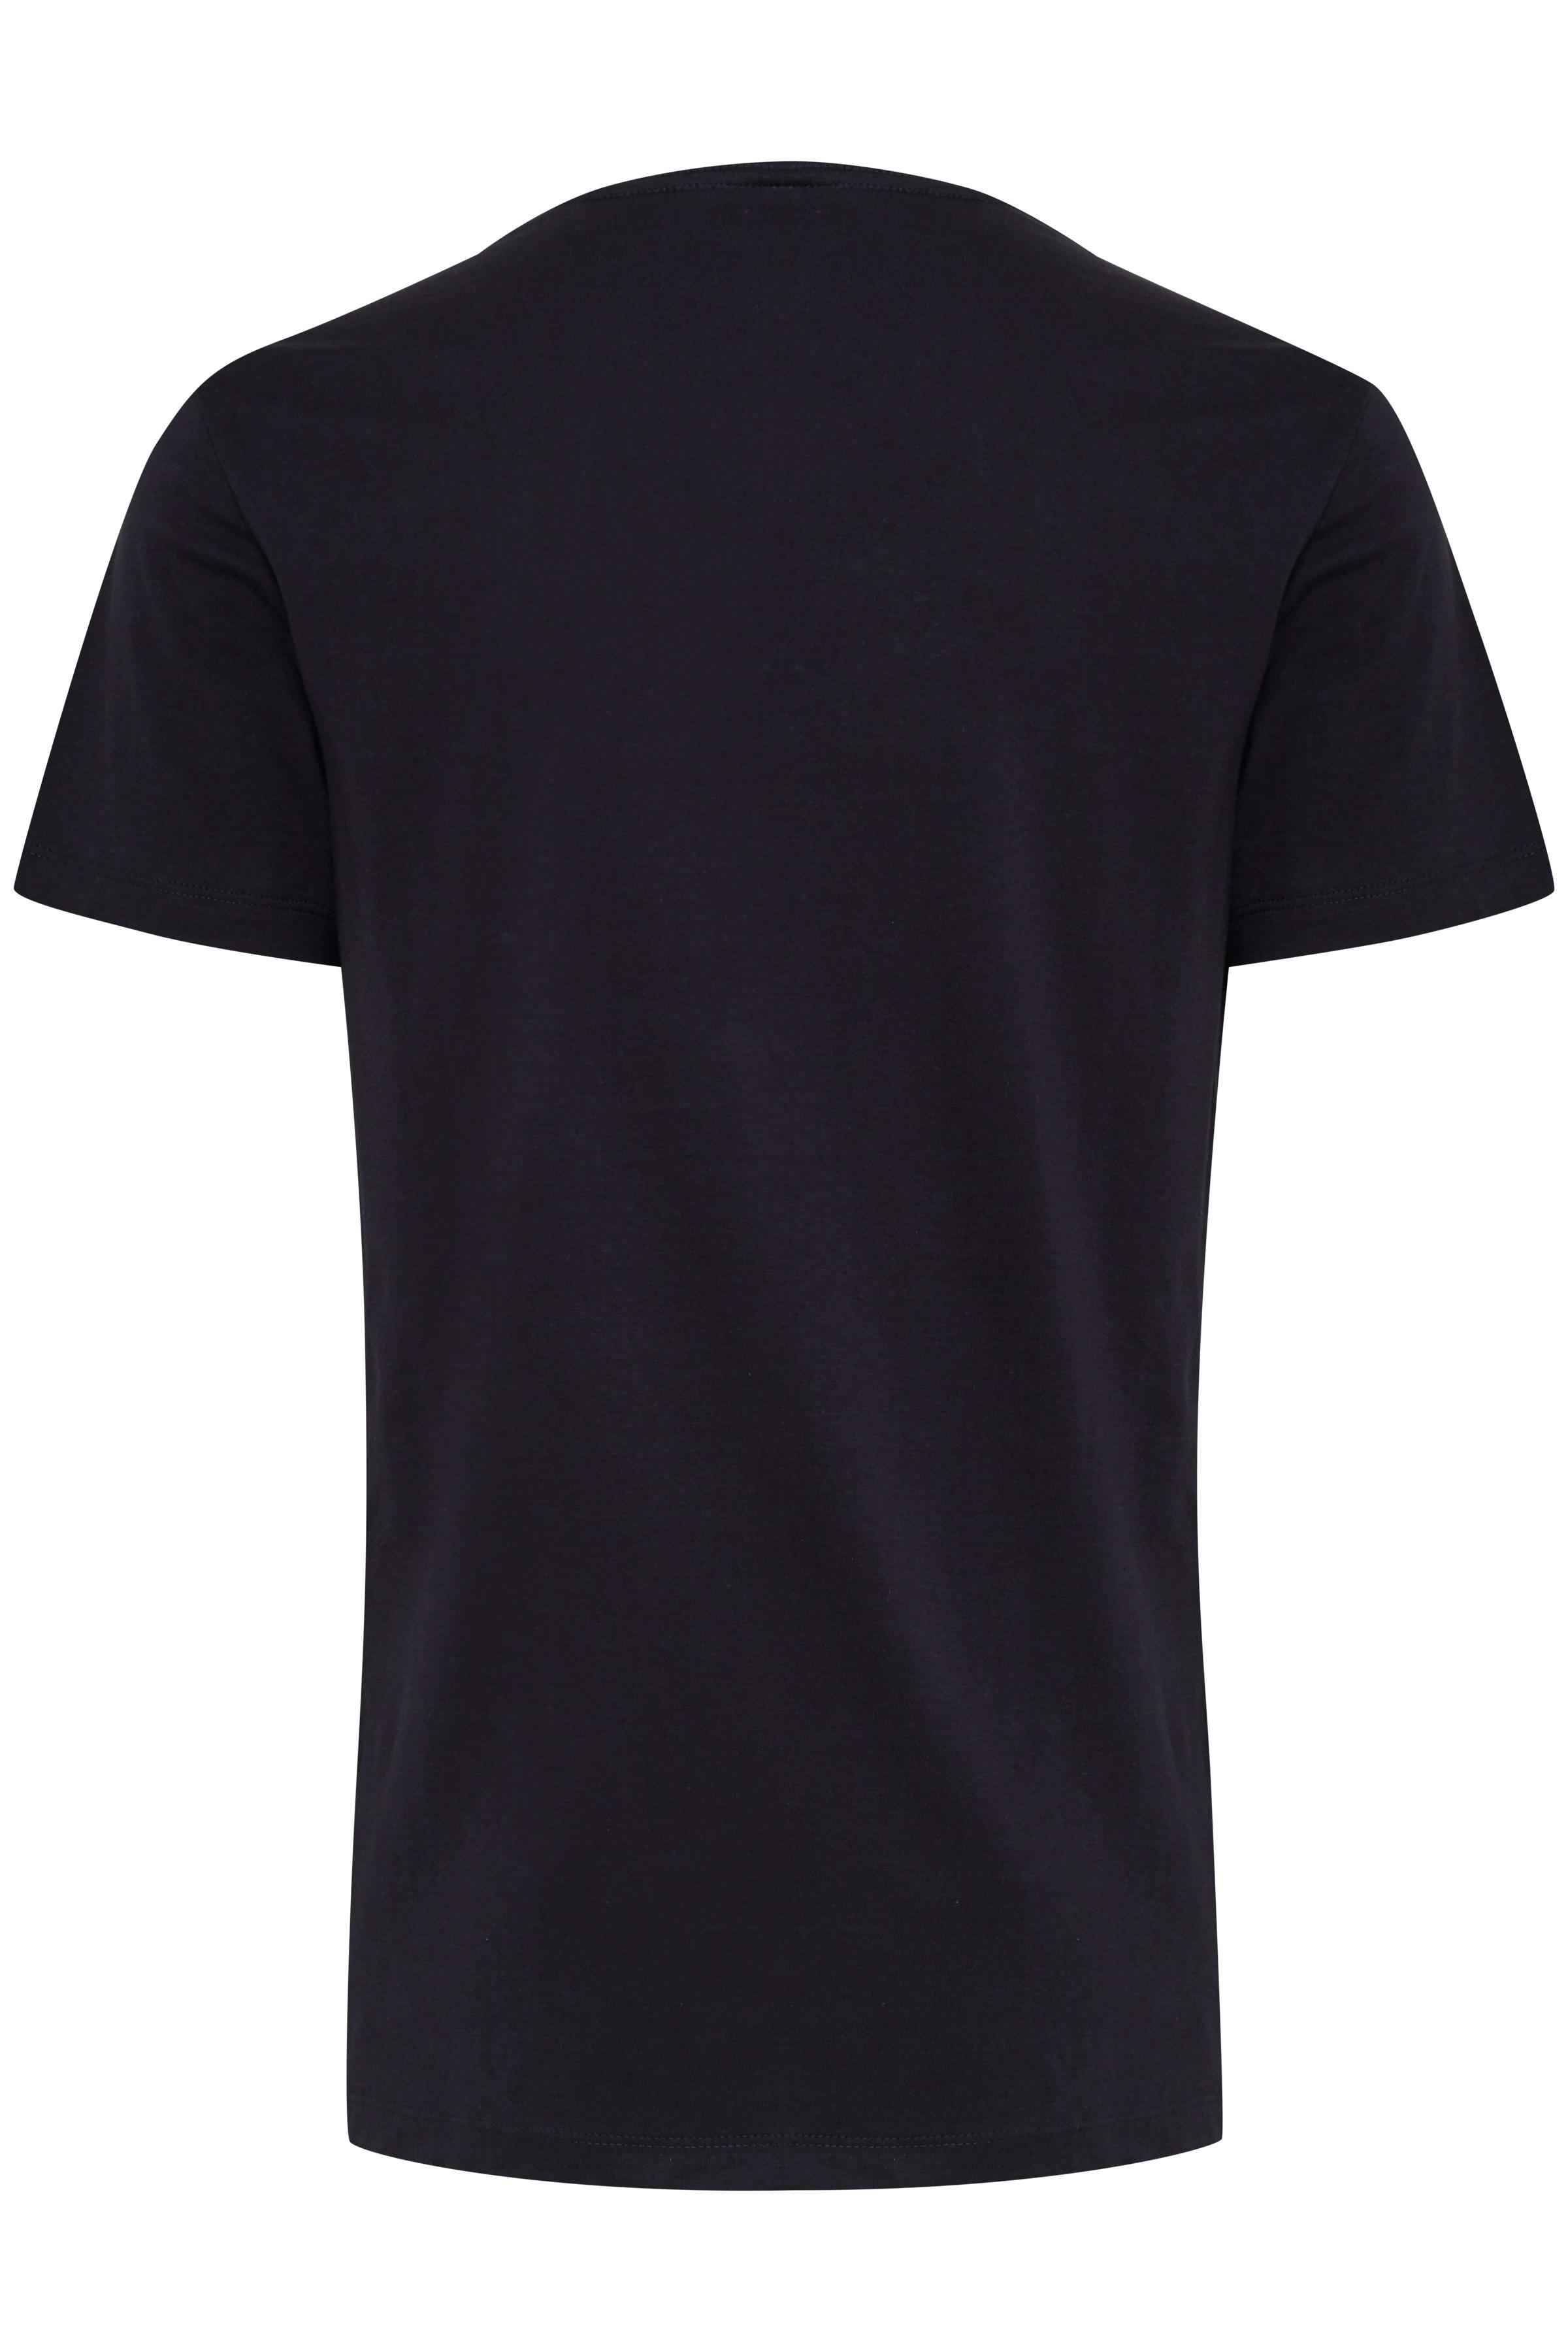 Dark Navy Blue T-shirt – Køb Dark Navy Blue T-shirt fra str. S-XL her